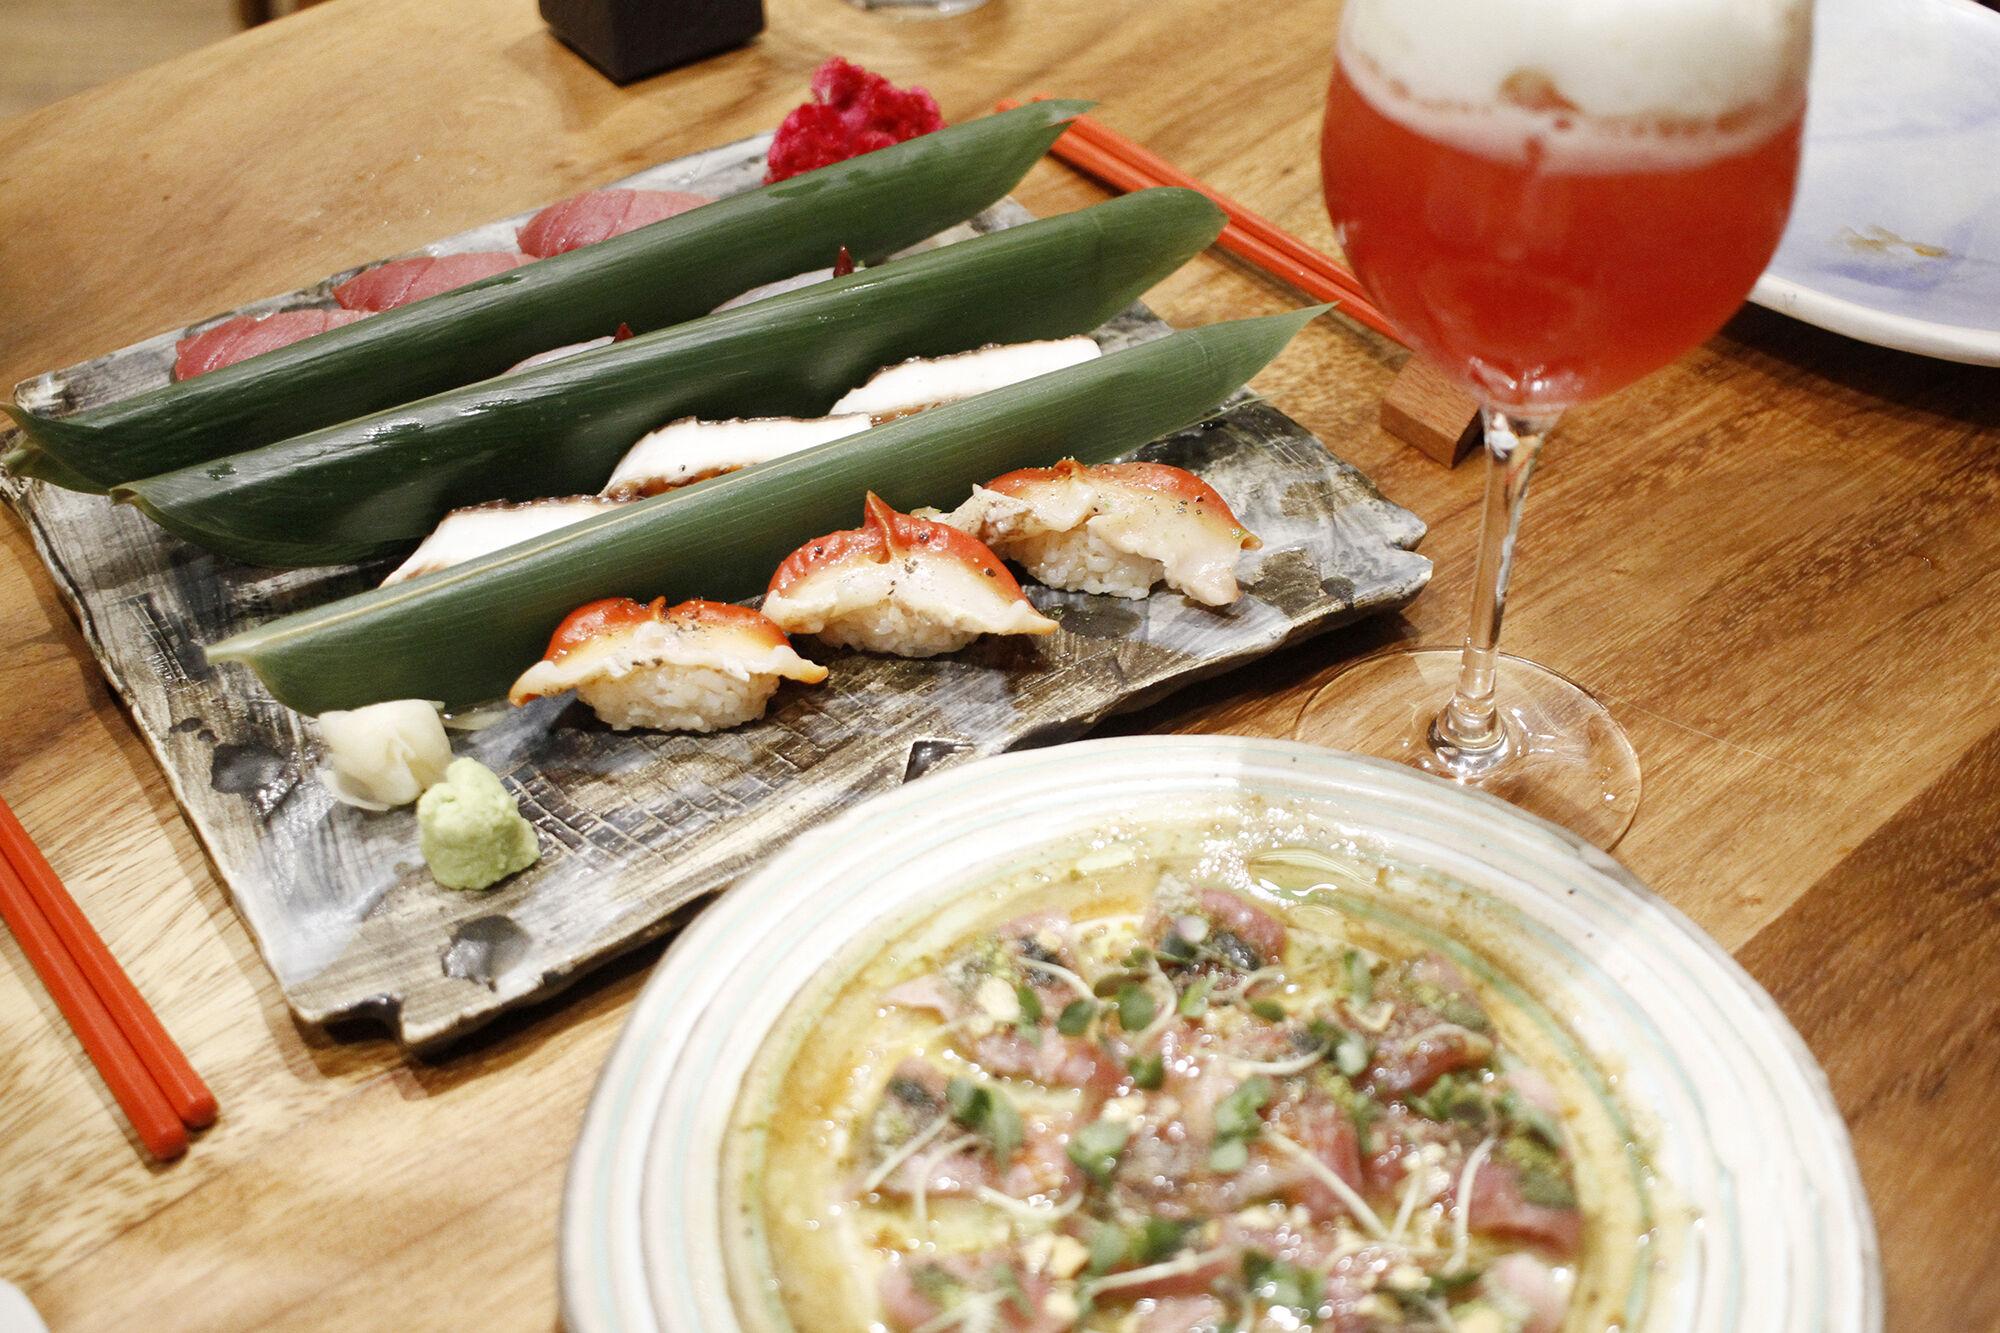 makoto cocina japonesa contempor nea coolhuntermx